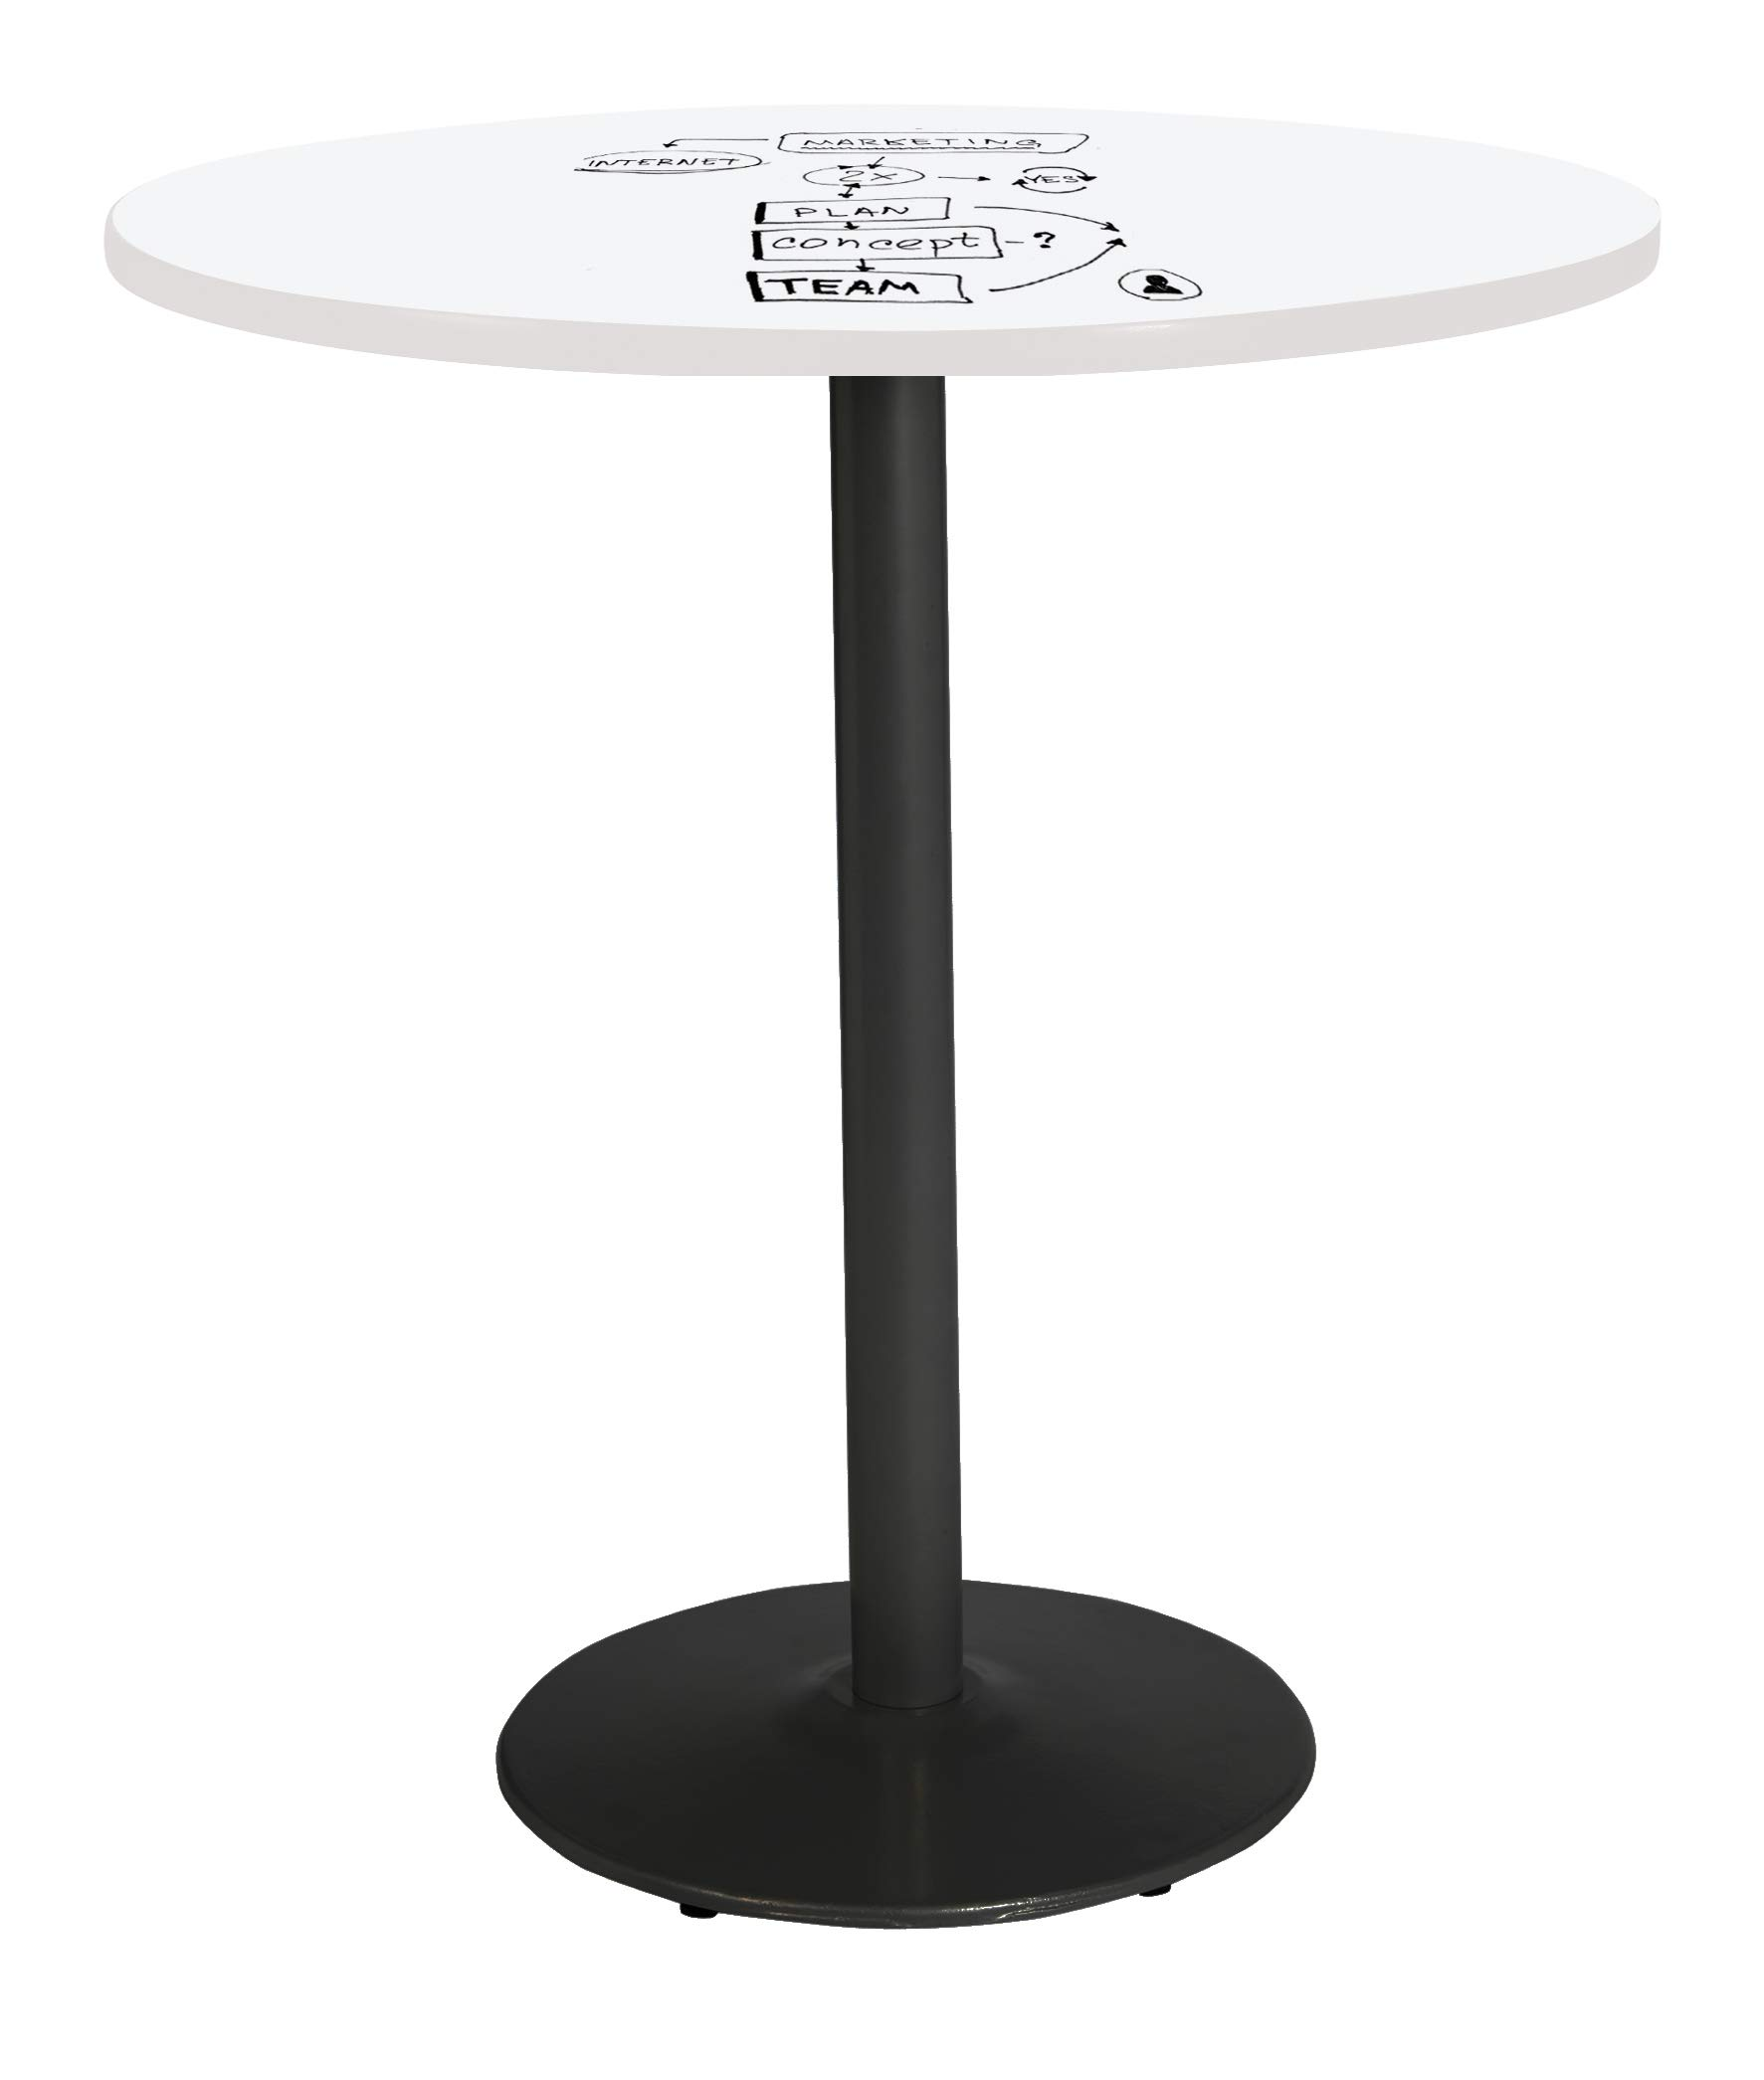 KFI T42RD-B1922-BK-3105-WH-38 Mode Pedestal Table 42'' White